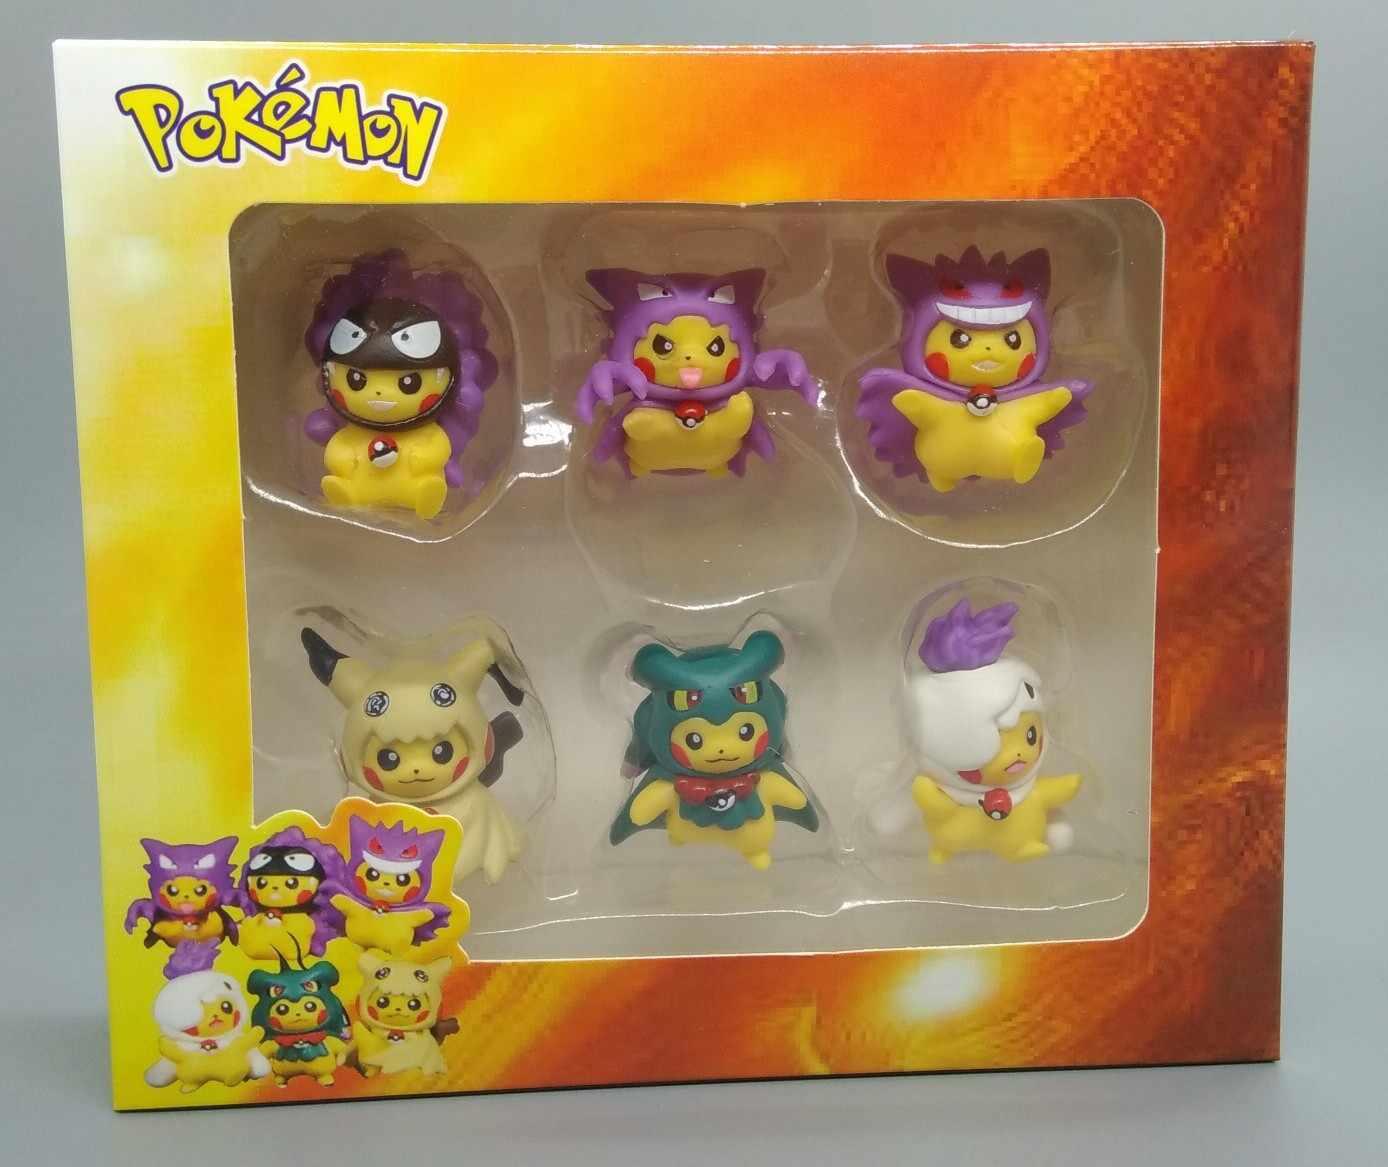 Брелок TAKARA TOMY Pokemon Pikachu Cos Gaigar Mimi Kiu, брелок без ключа, Детский Рождественский подарок